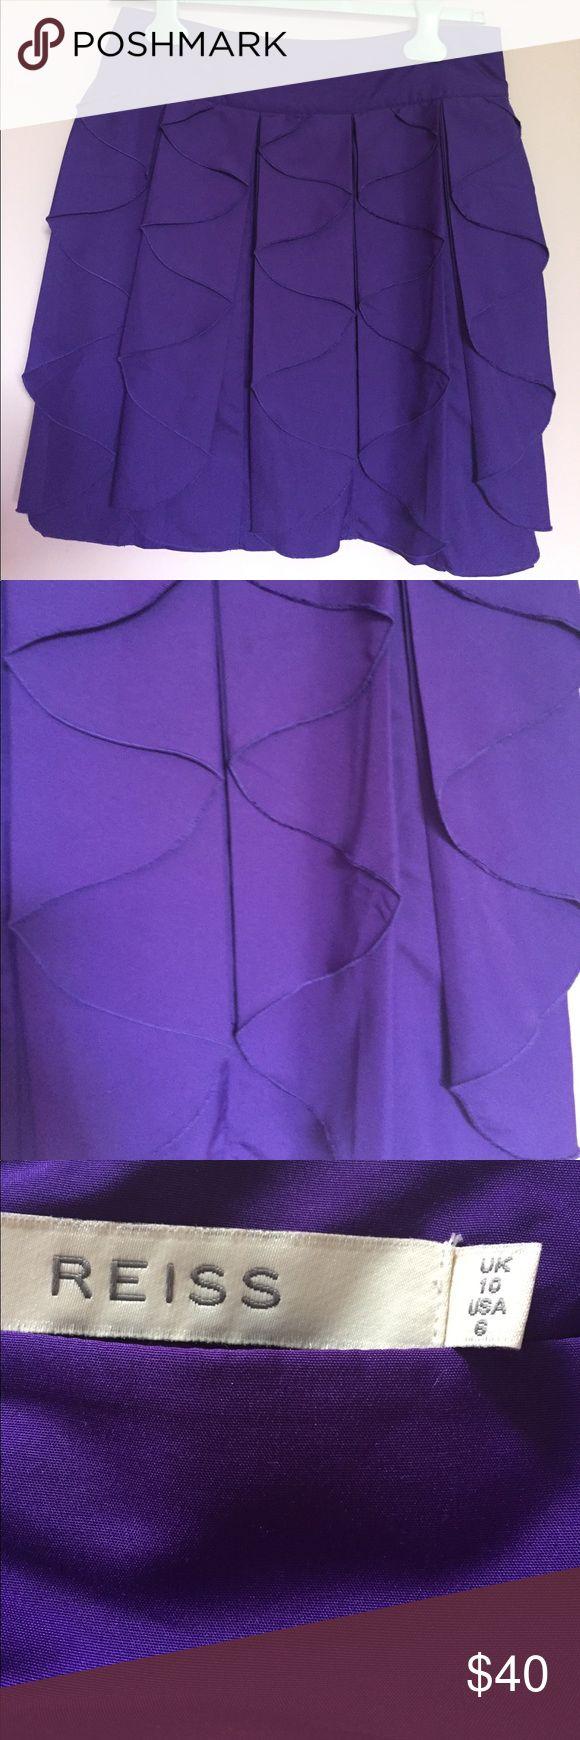 Reiss skirt Beautiful Reiss Vegas skirt in deep purple.  This skirt has a super interesting fold detail that's really unusual. Reiss Skirts